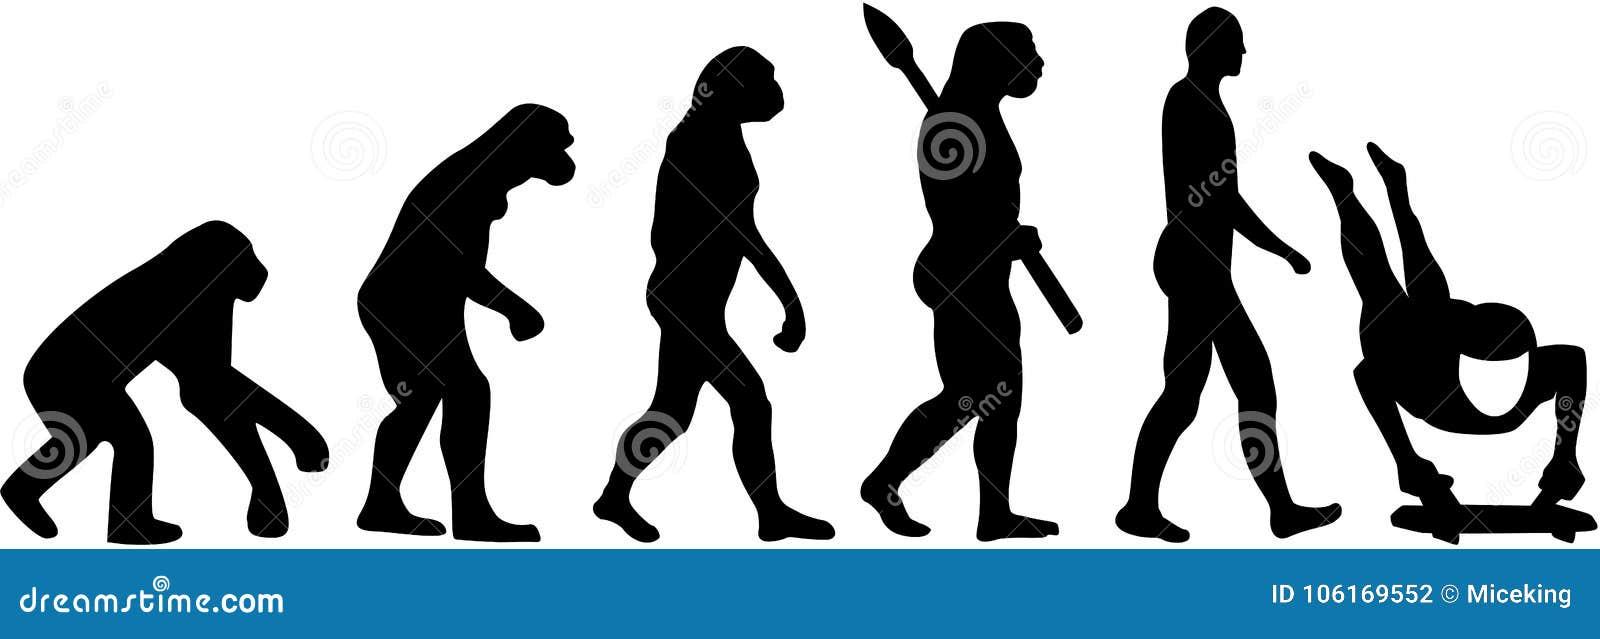 Zredukowana ewolucja